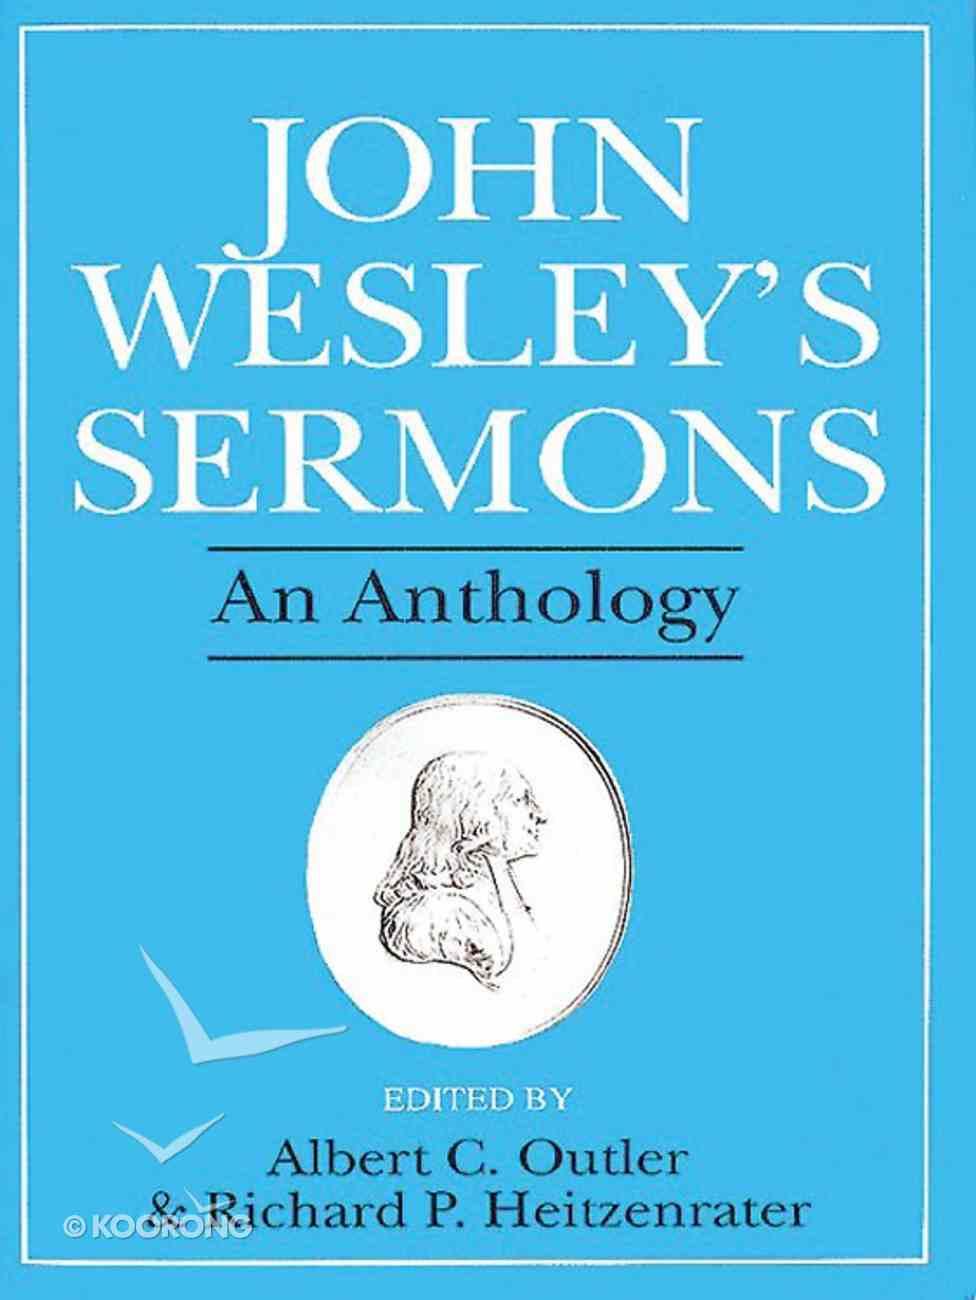 John Wesley's Sermons Paperback